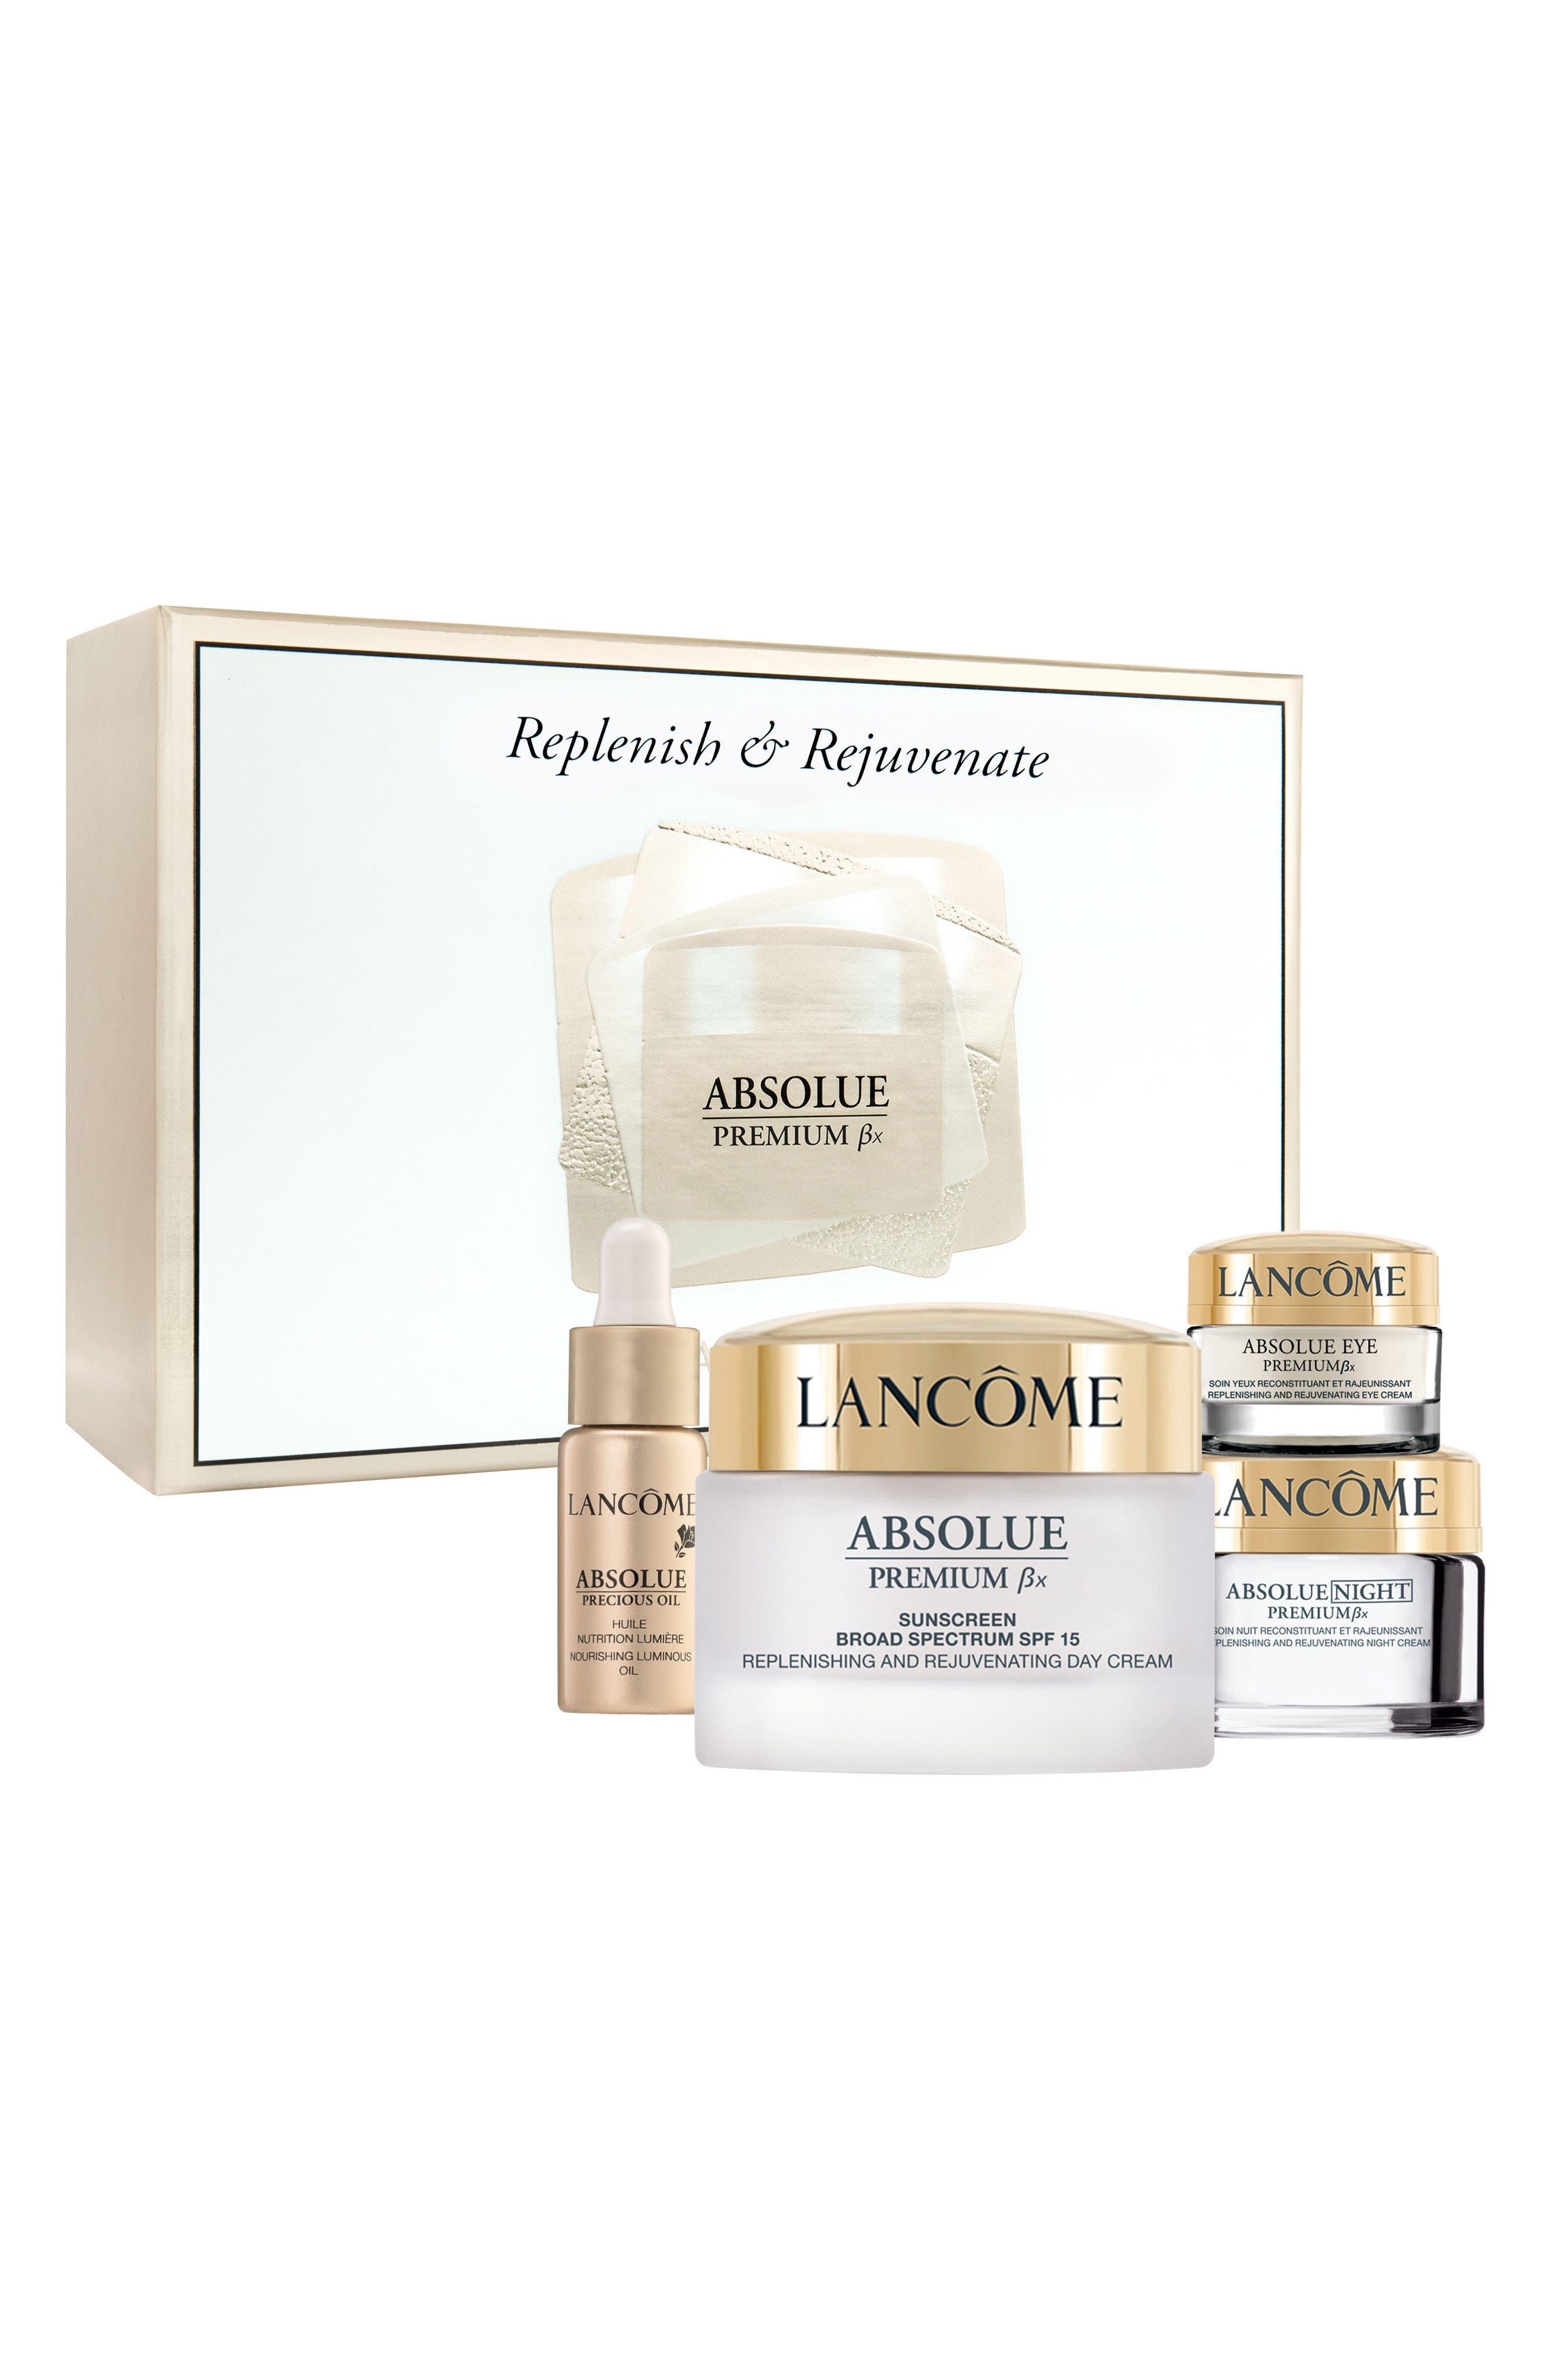 Lancôme Replenish & Rejuvenate Absolue Premium Bx Set